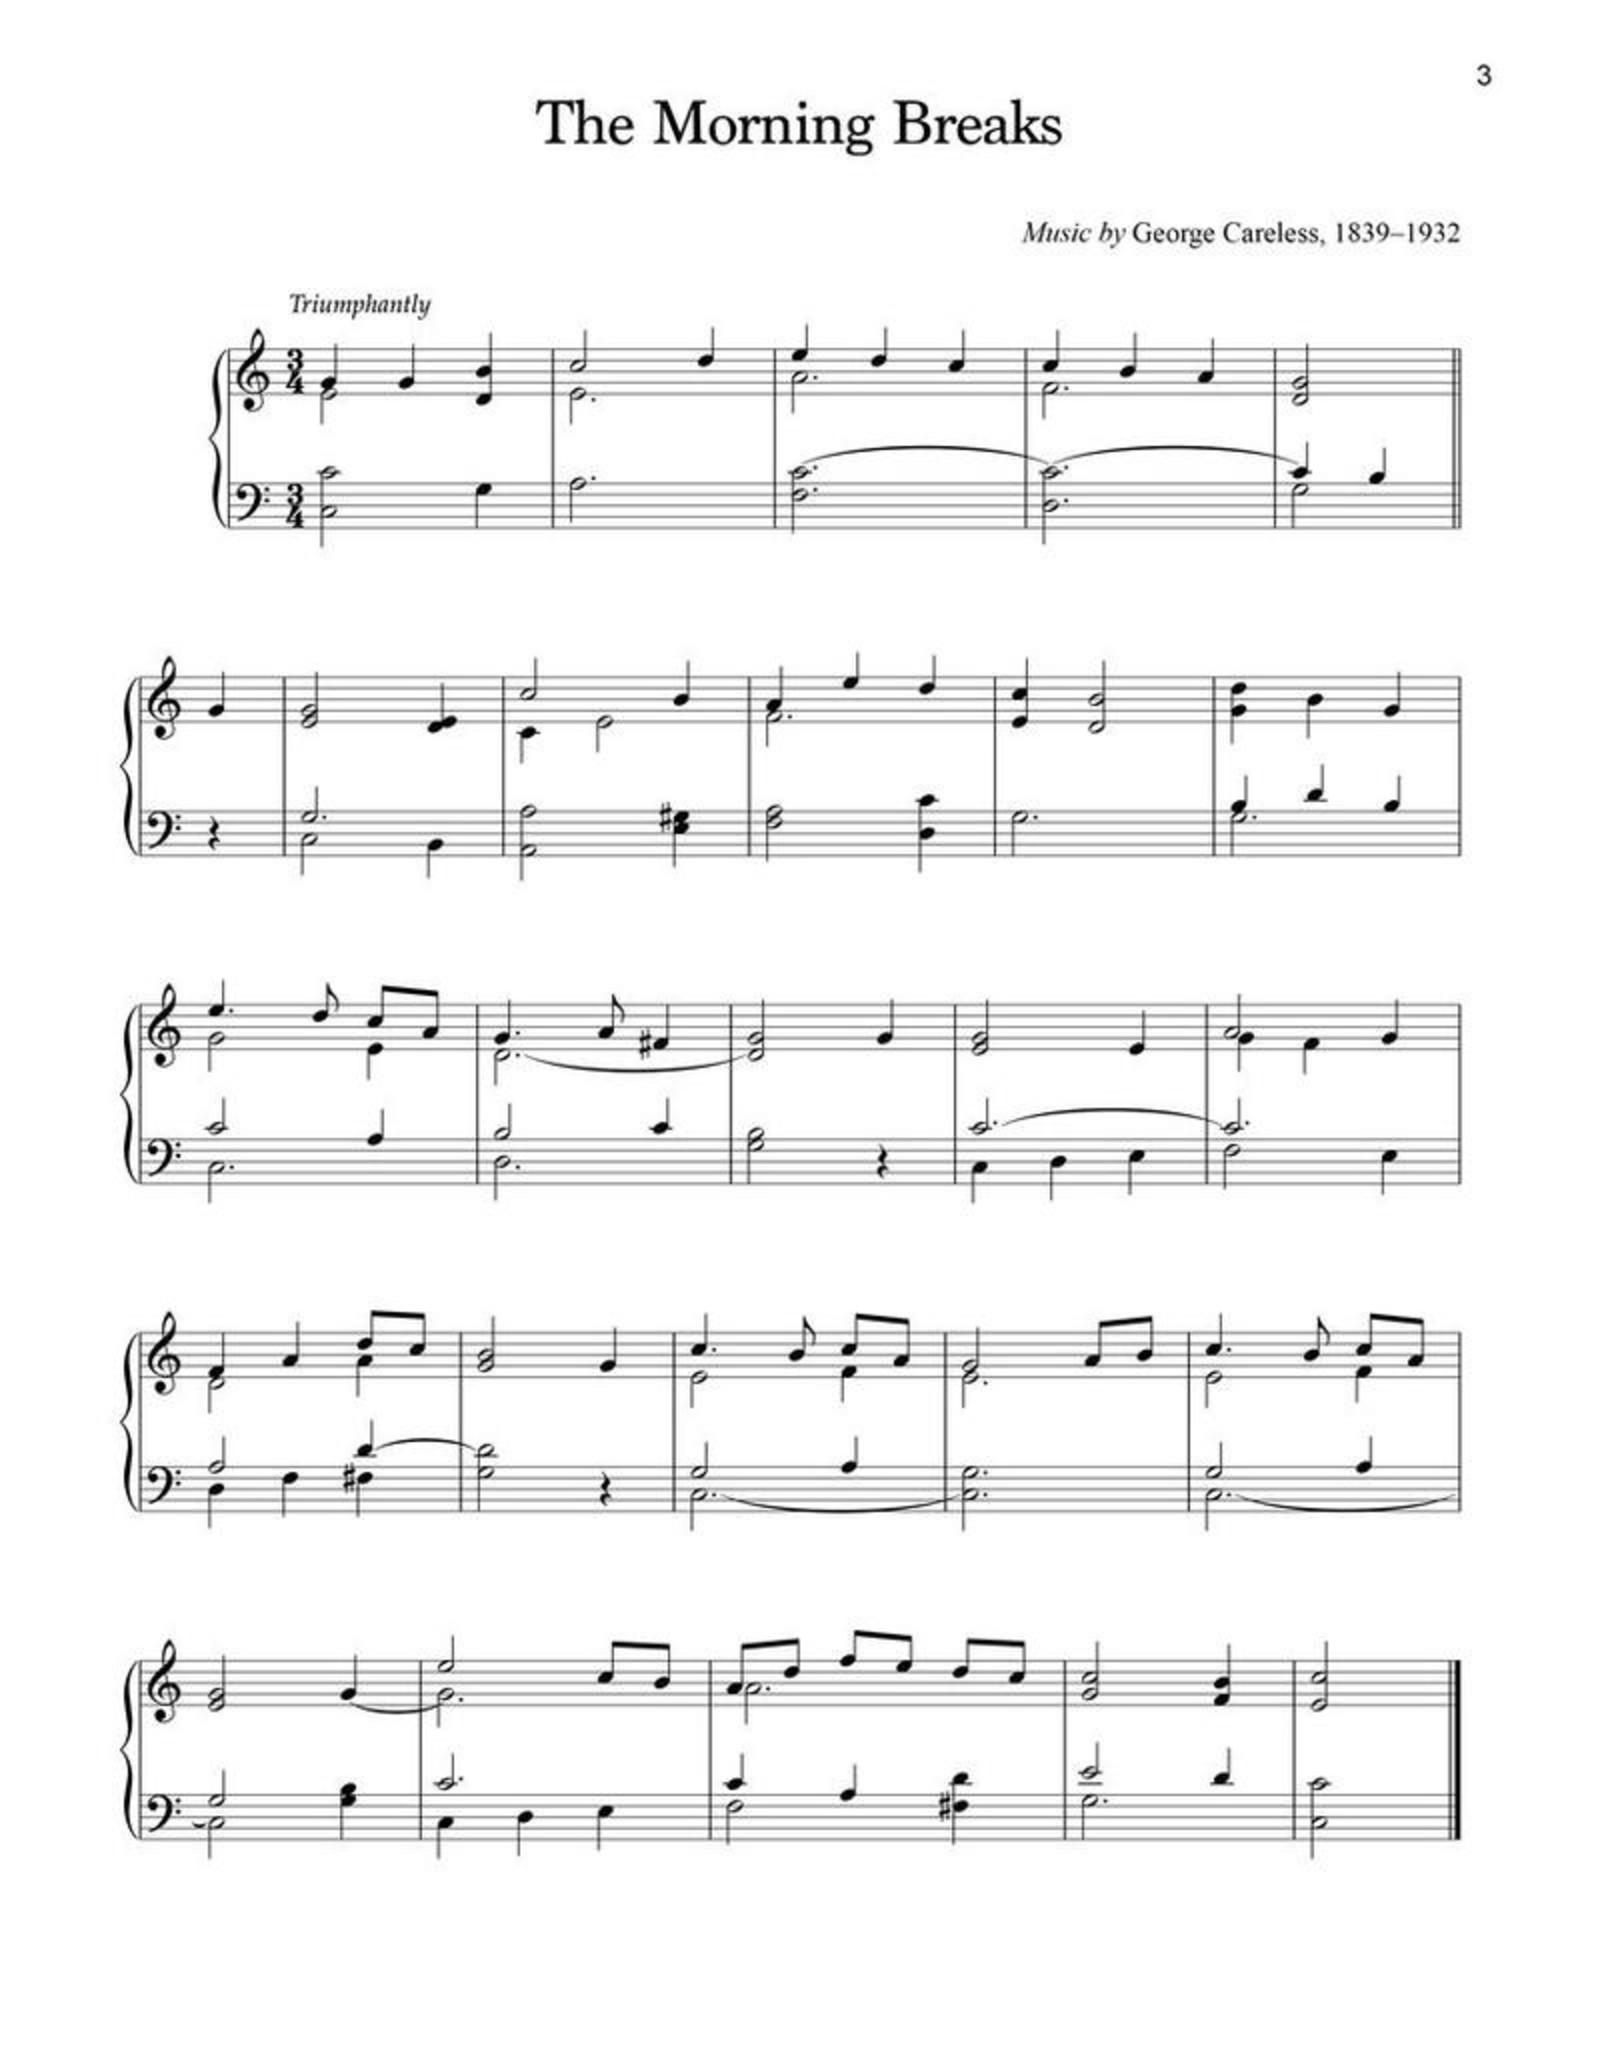 Jackman Music 50 Hymn Preludes for the Bass Coupler Organist Volume 1 arr. Brent Jorgensen